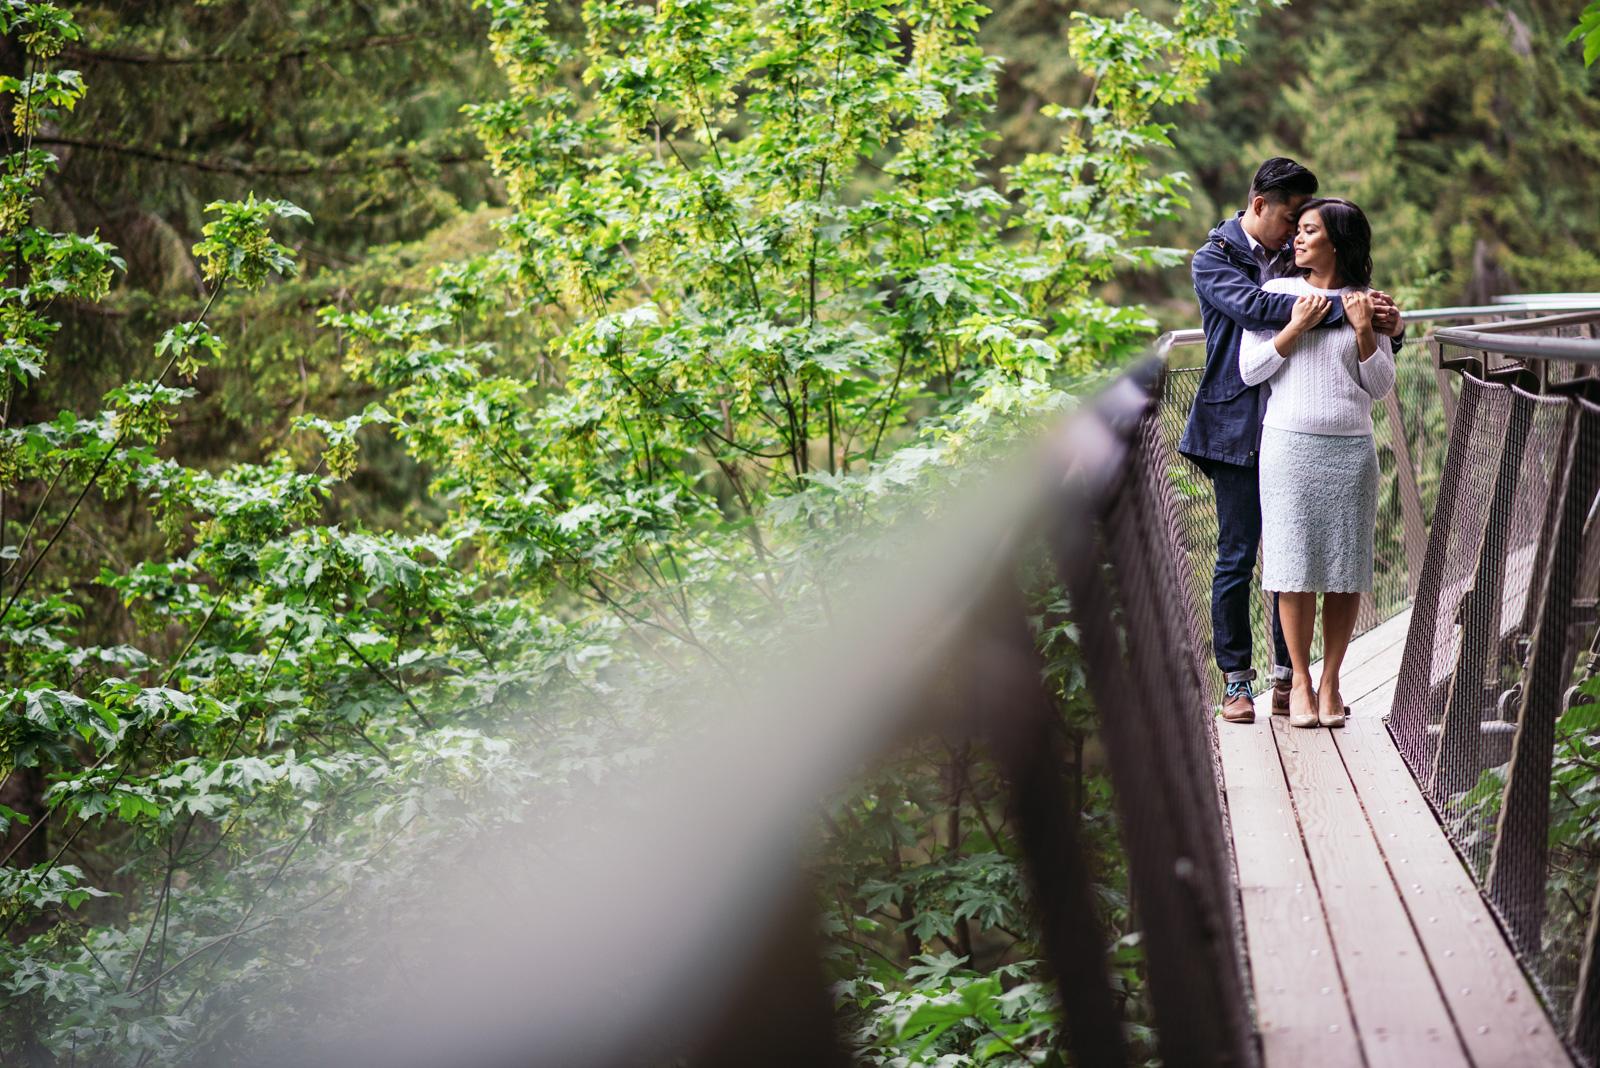 vancouver-island-wedding-photographers-capilano-suspension-bridge-engagement-9.jpg